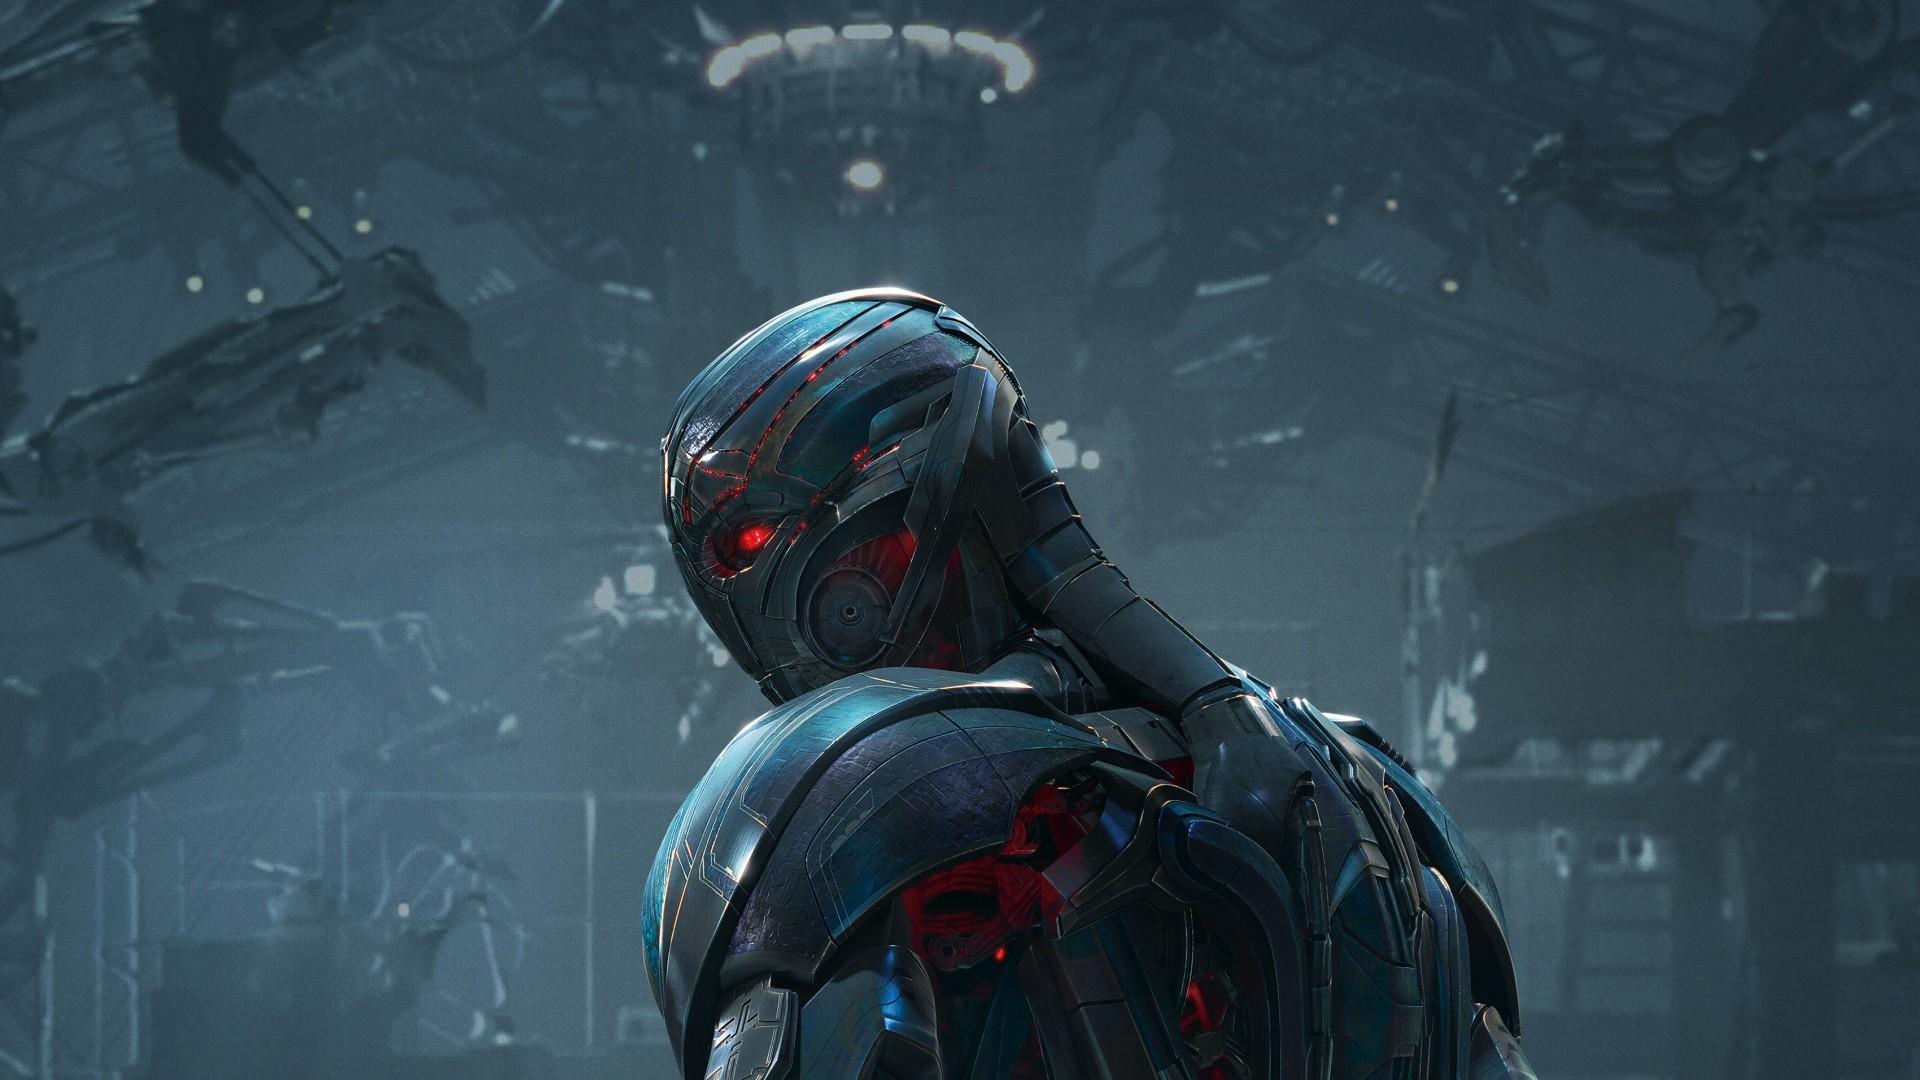 Wallpaper avengers age of ultron, sci-fi, james spader